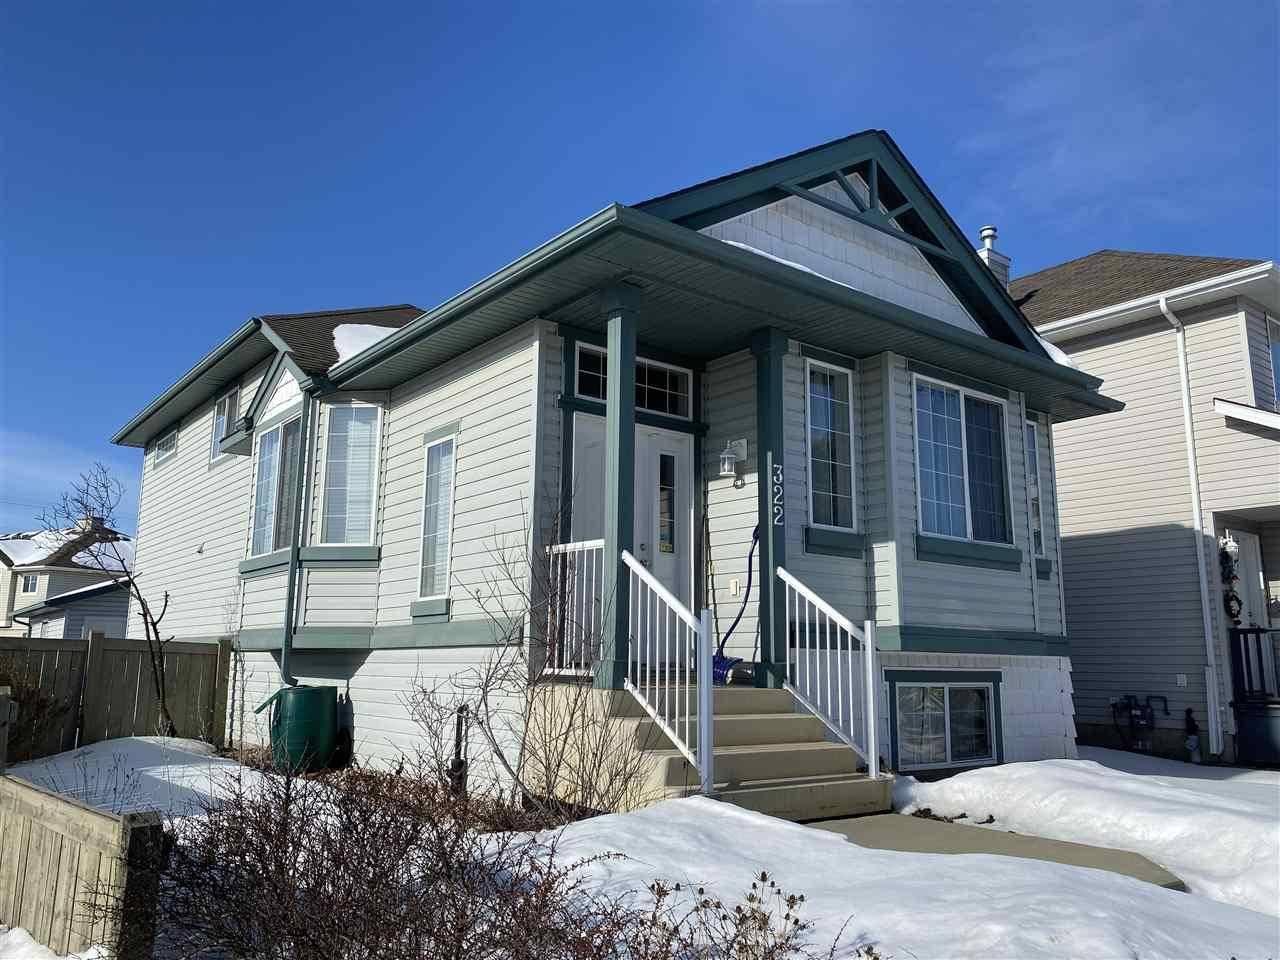 House for sale at 322 85 St Sw Edmonton Alberta - MLS: E4188660